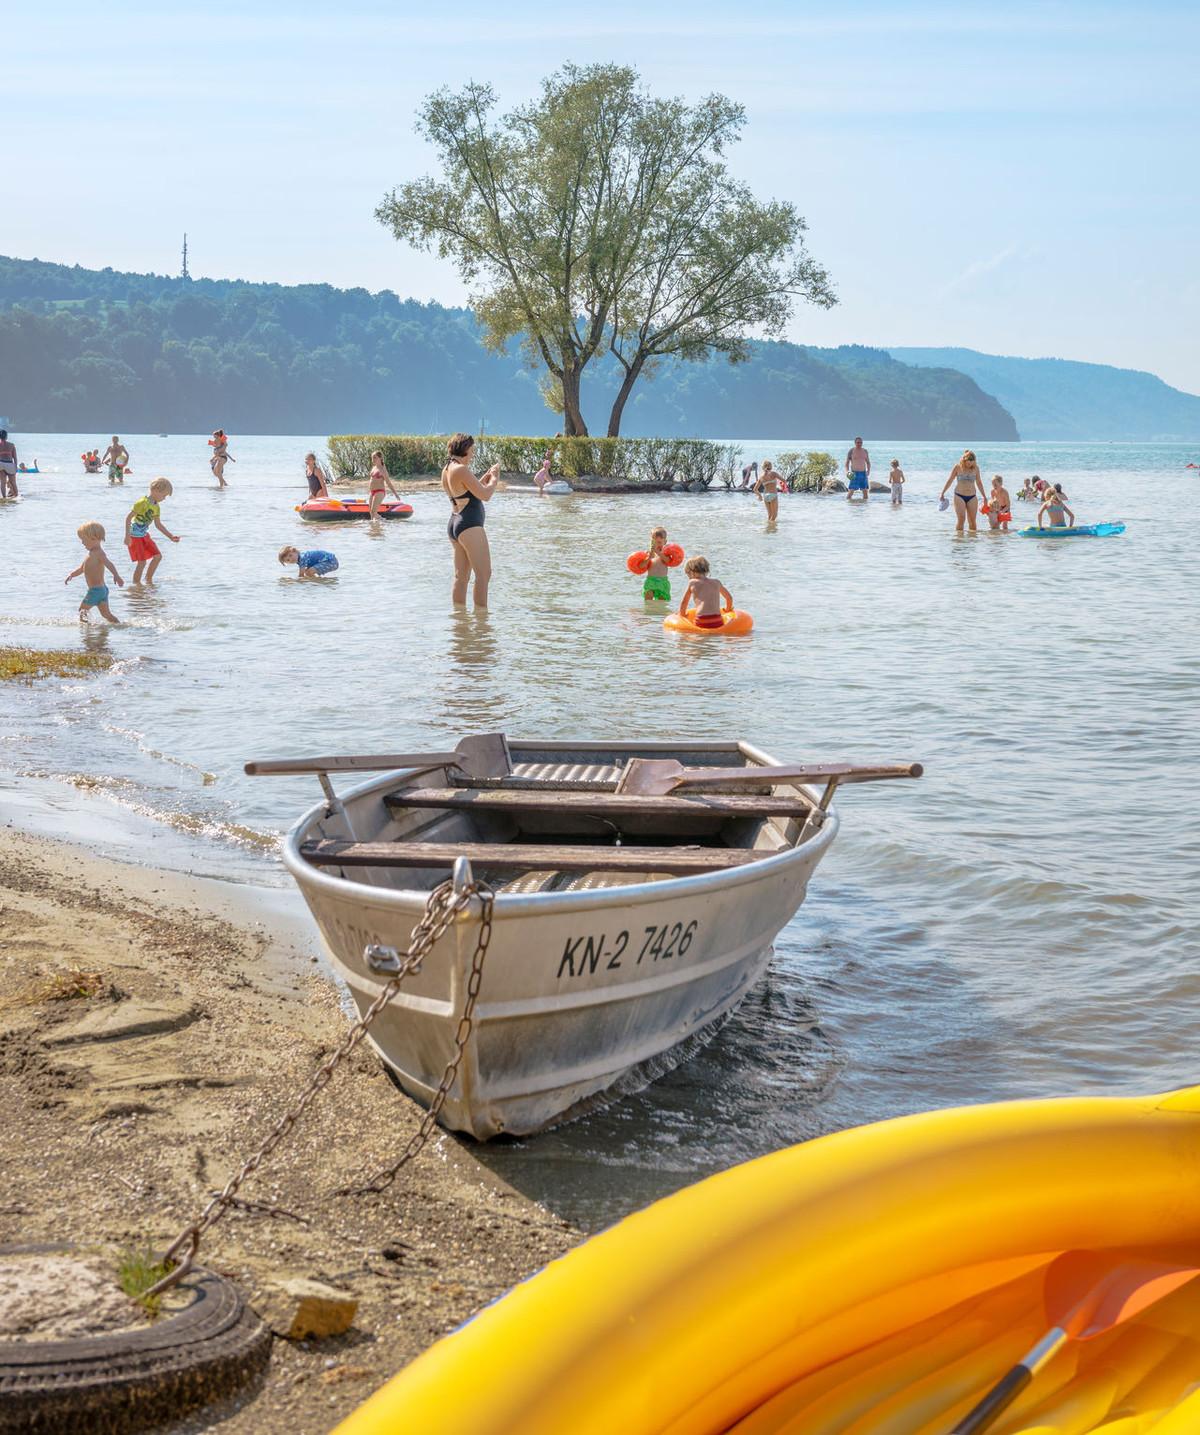 Konstanz-Klausenhorn-Bodensee-Strandbad-Boot-01_Herbst_Copyright_MTK-Dagmar-Schwelle